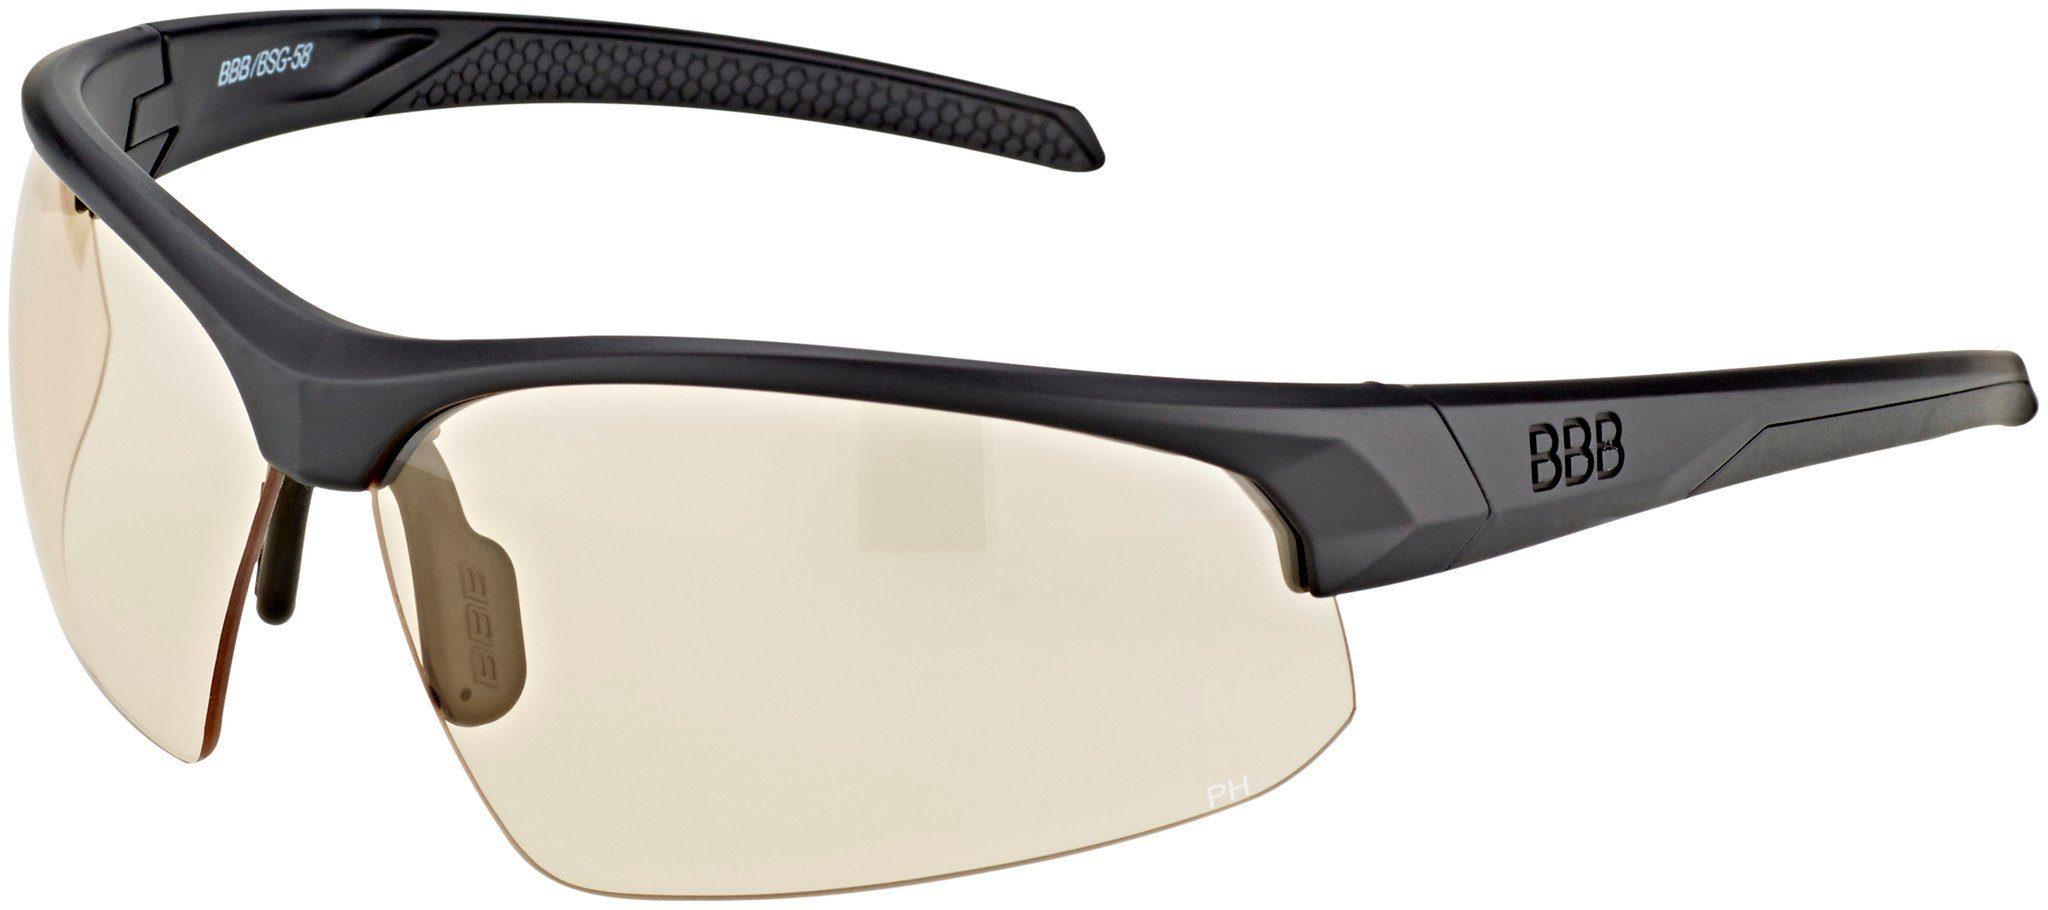 BBB Sportbrille »Impress PH BSG-58PH Sportbrille«